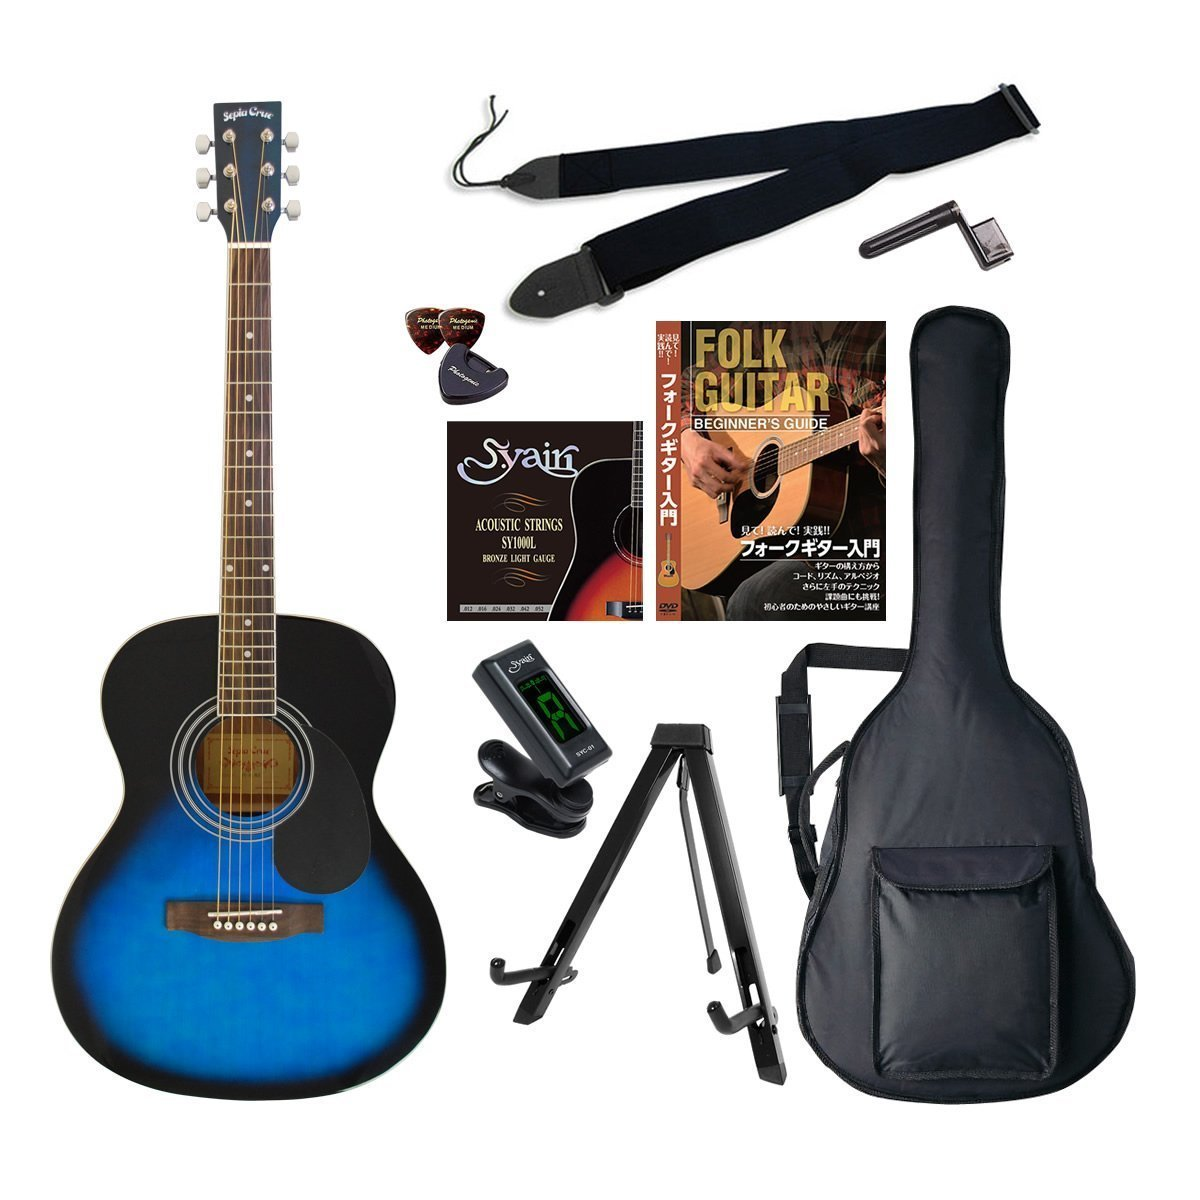 SepiaCrue(セピアクルー) 初心者入門10点セット アコースティックギター エントリーセット FG-10/BLS ブルーサンバースト B01H51DSKU ブルーサンバースト ブルーサンバースト